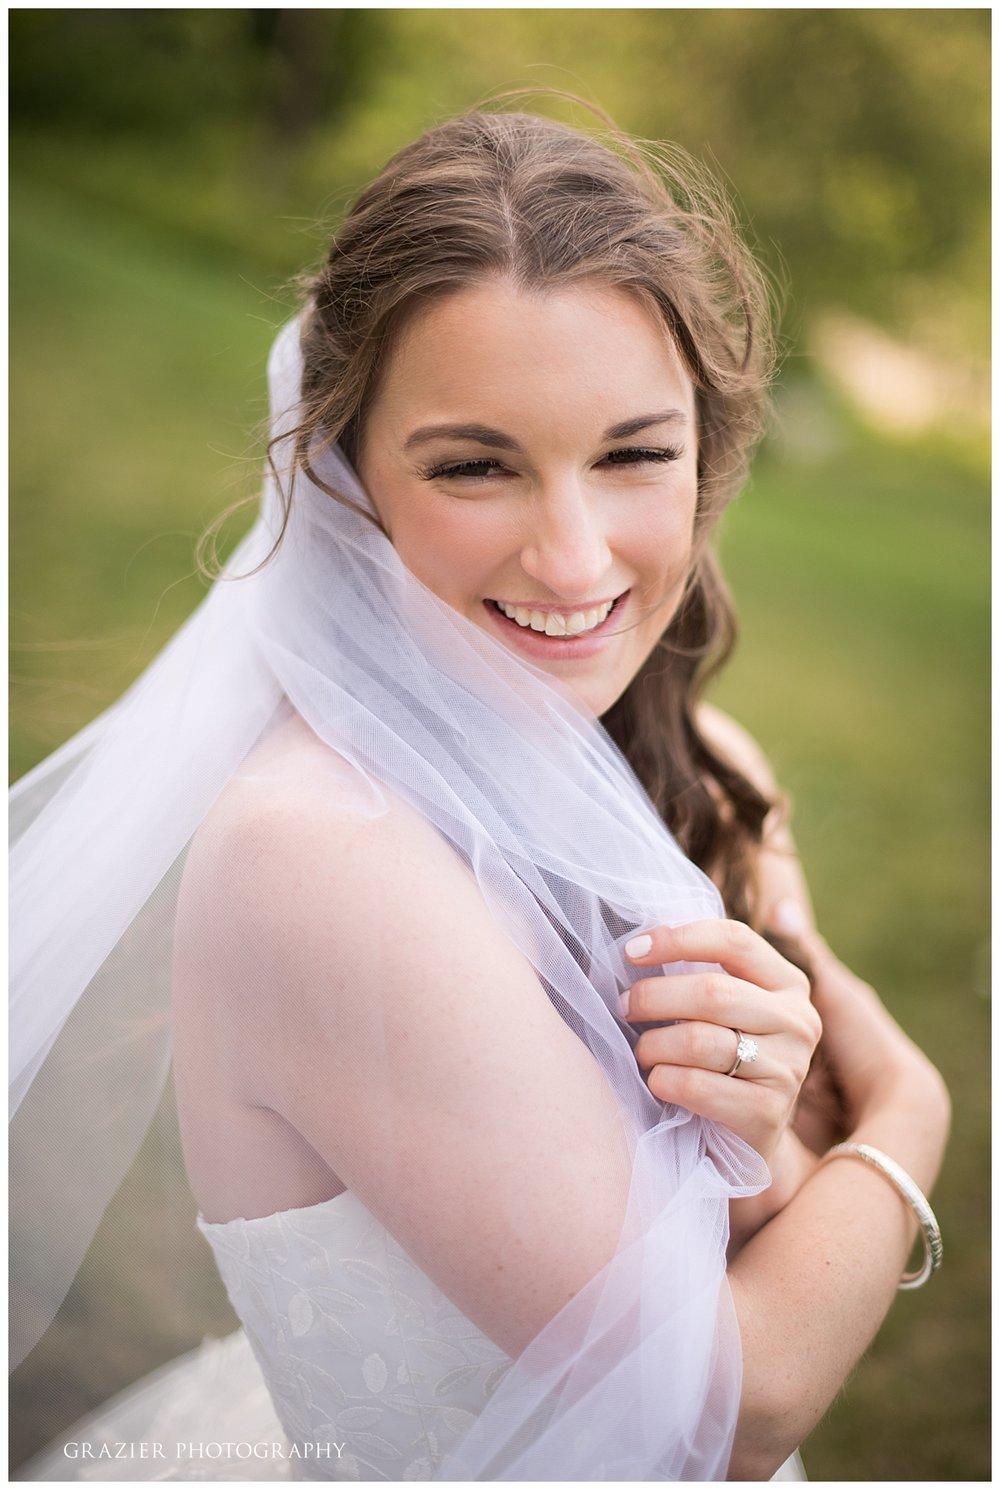 Mount Washington Hotel Wedding Grazier Photography 171125-437_WEB.jpg